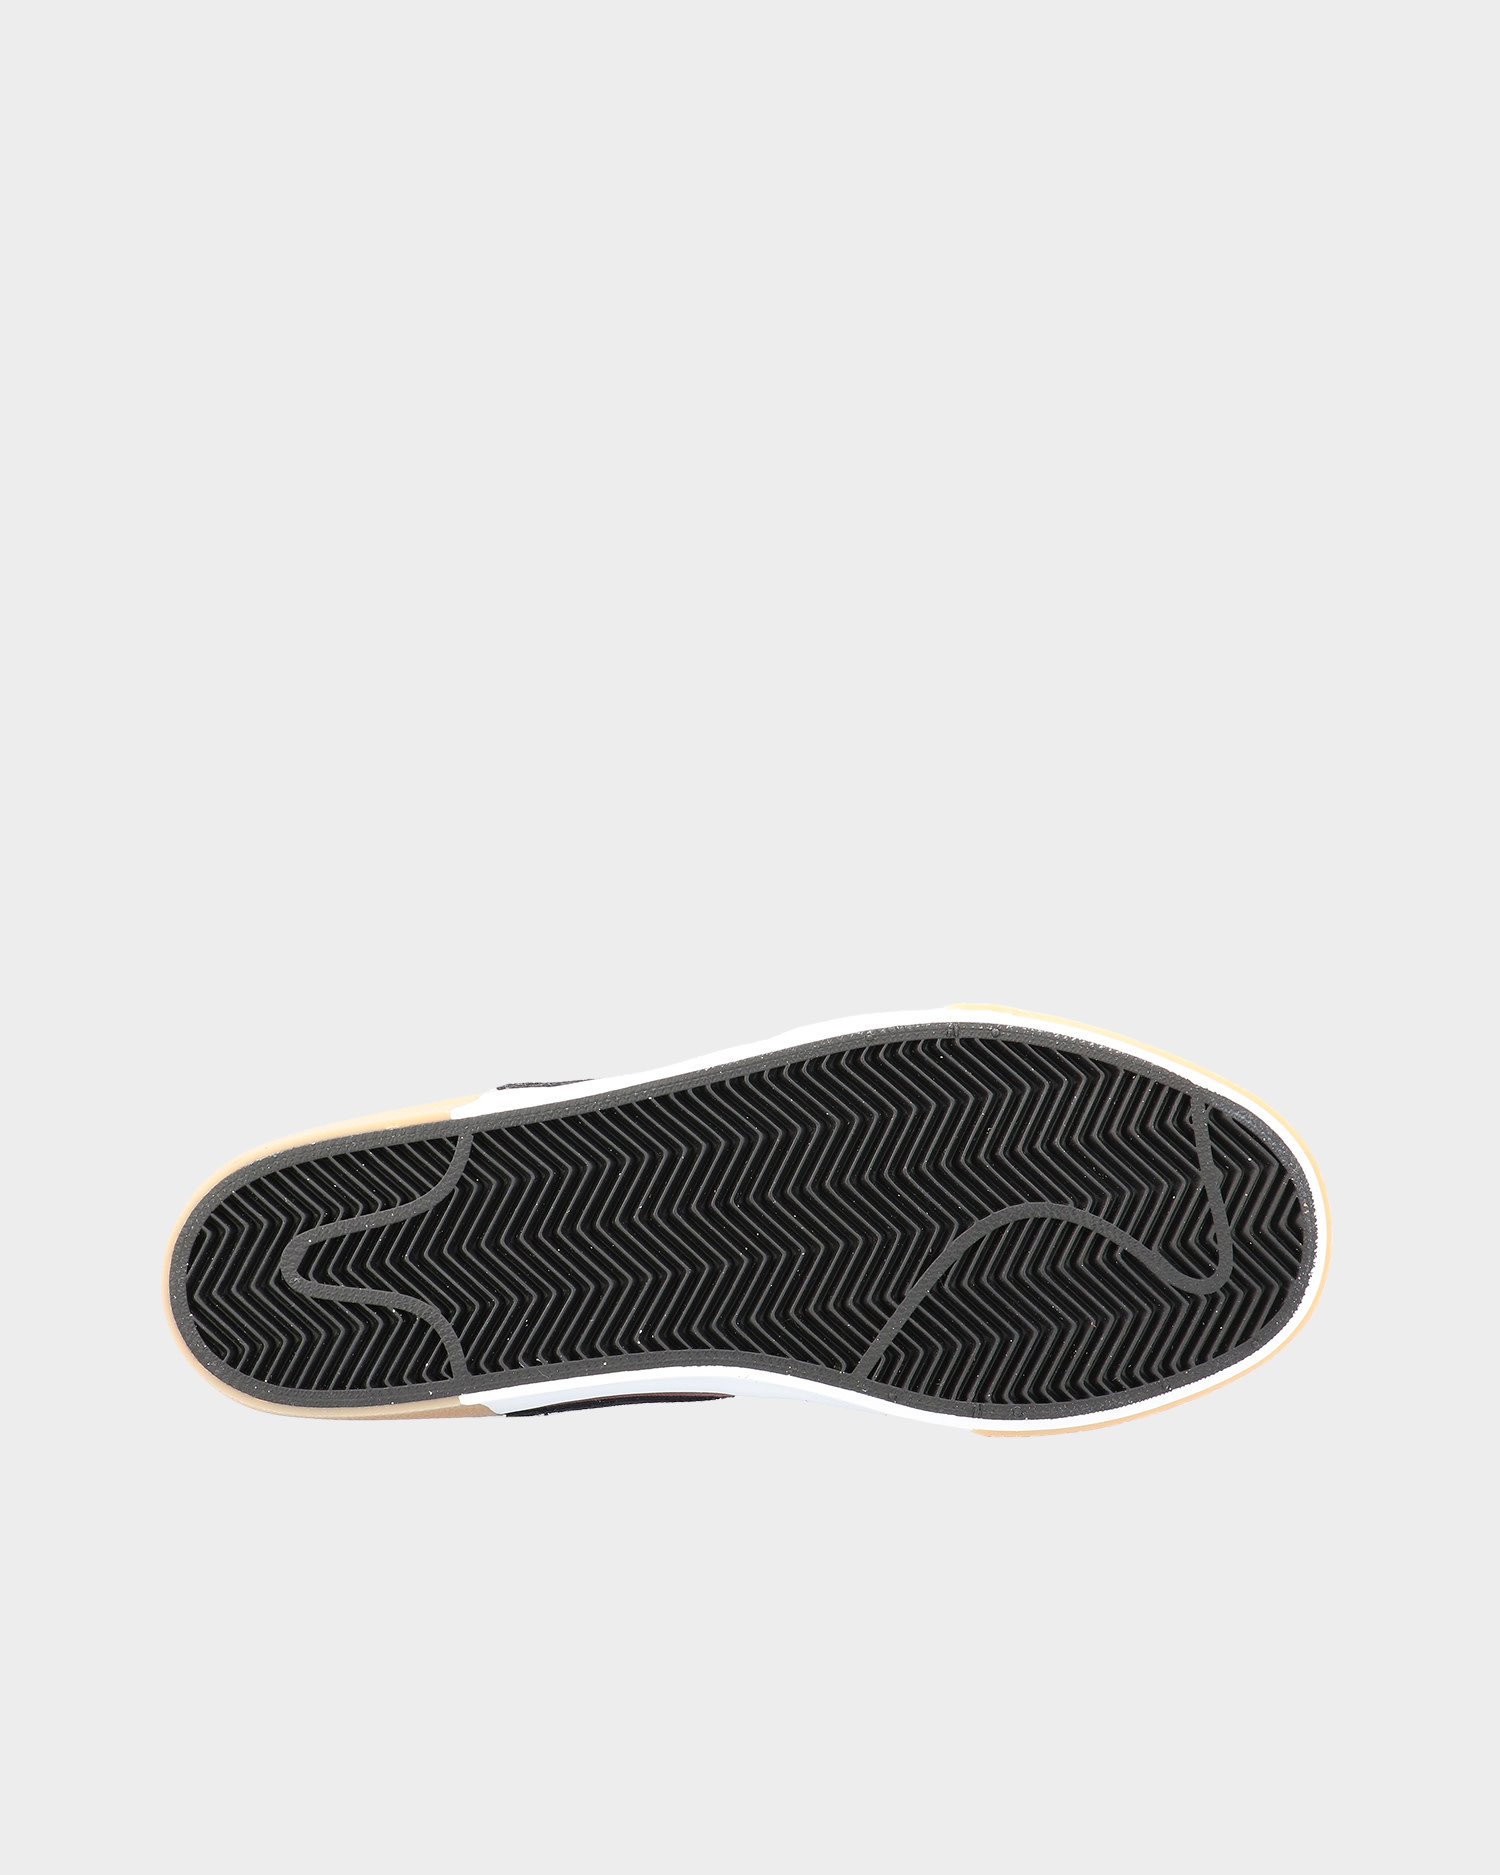 Nike SB Zoom Blazer Mid Dark wine/black-pink oxford-cashmere